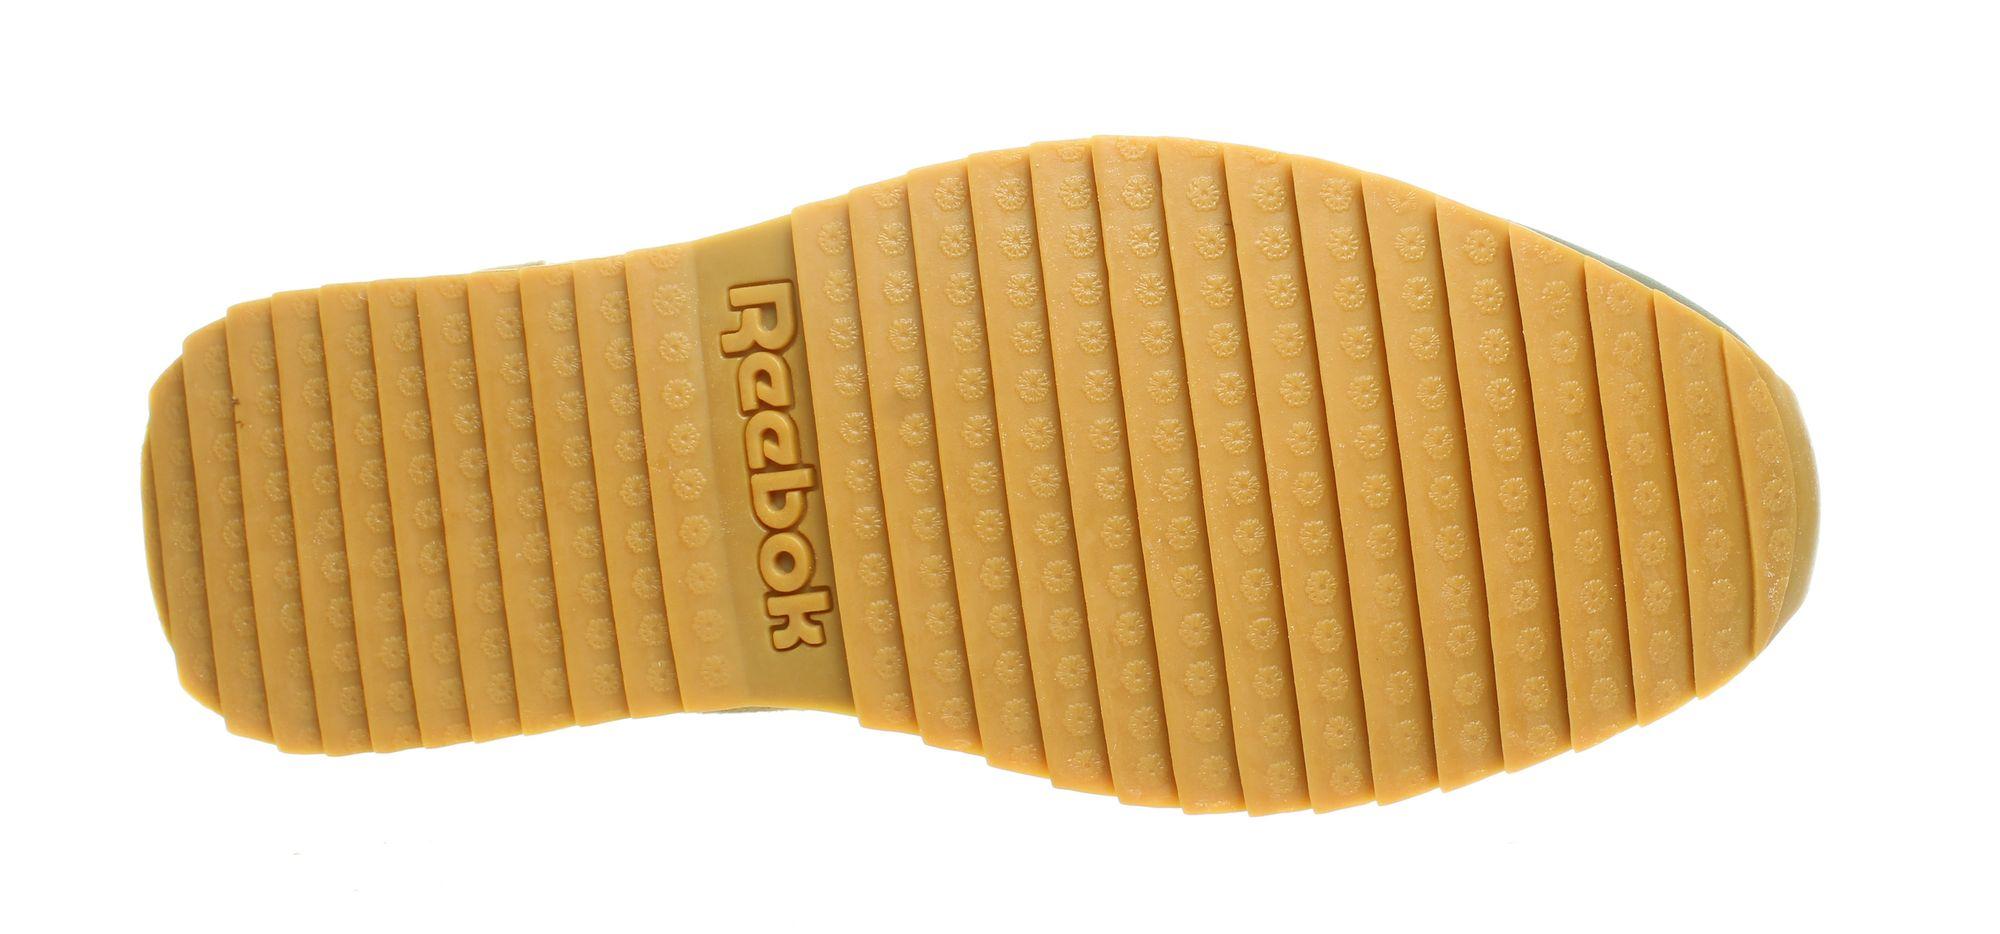 Reebok-Mens-Classic-Leather-Ripple-Fashion-Sneakers thumbnail 9